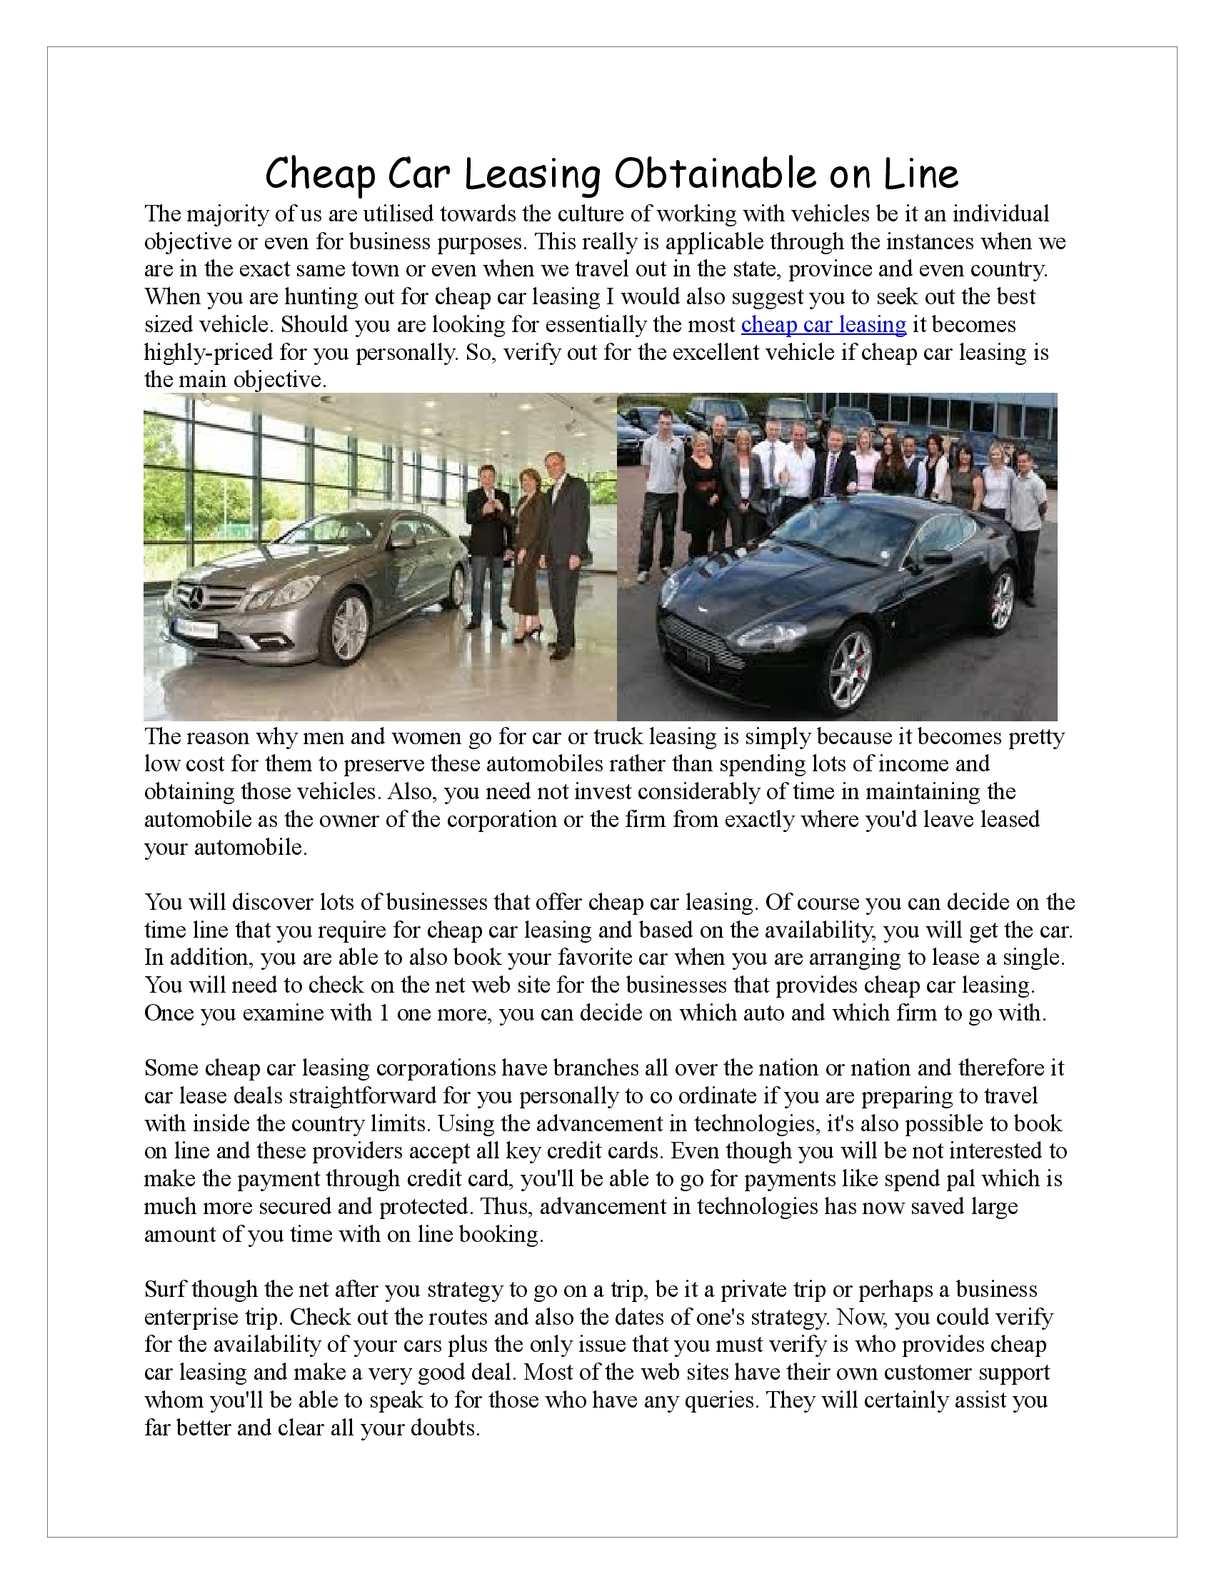 Calameo Cheap Car Leasing Obtainable On Line